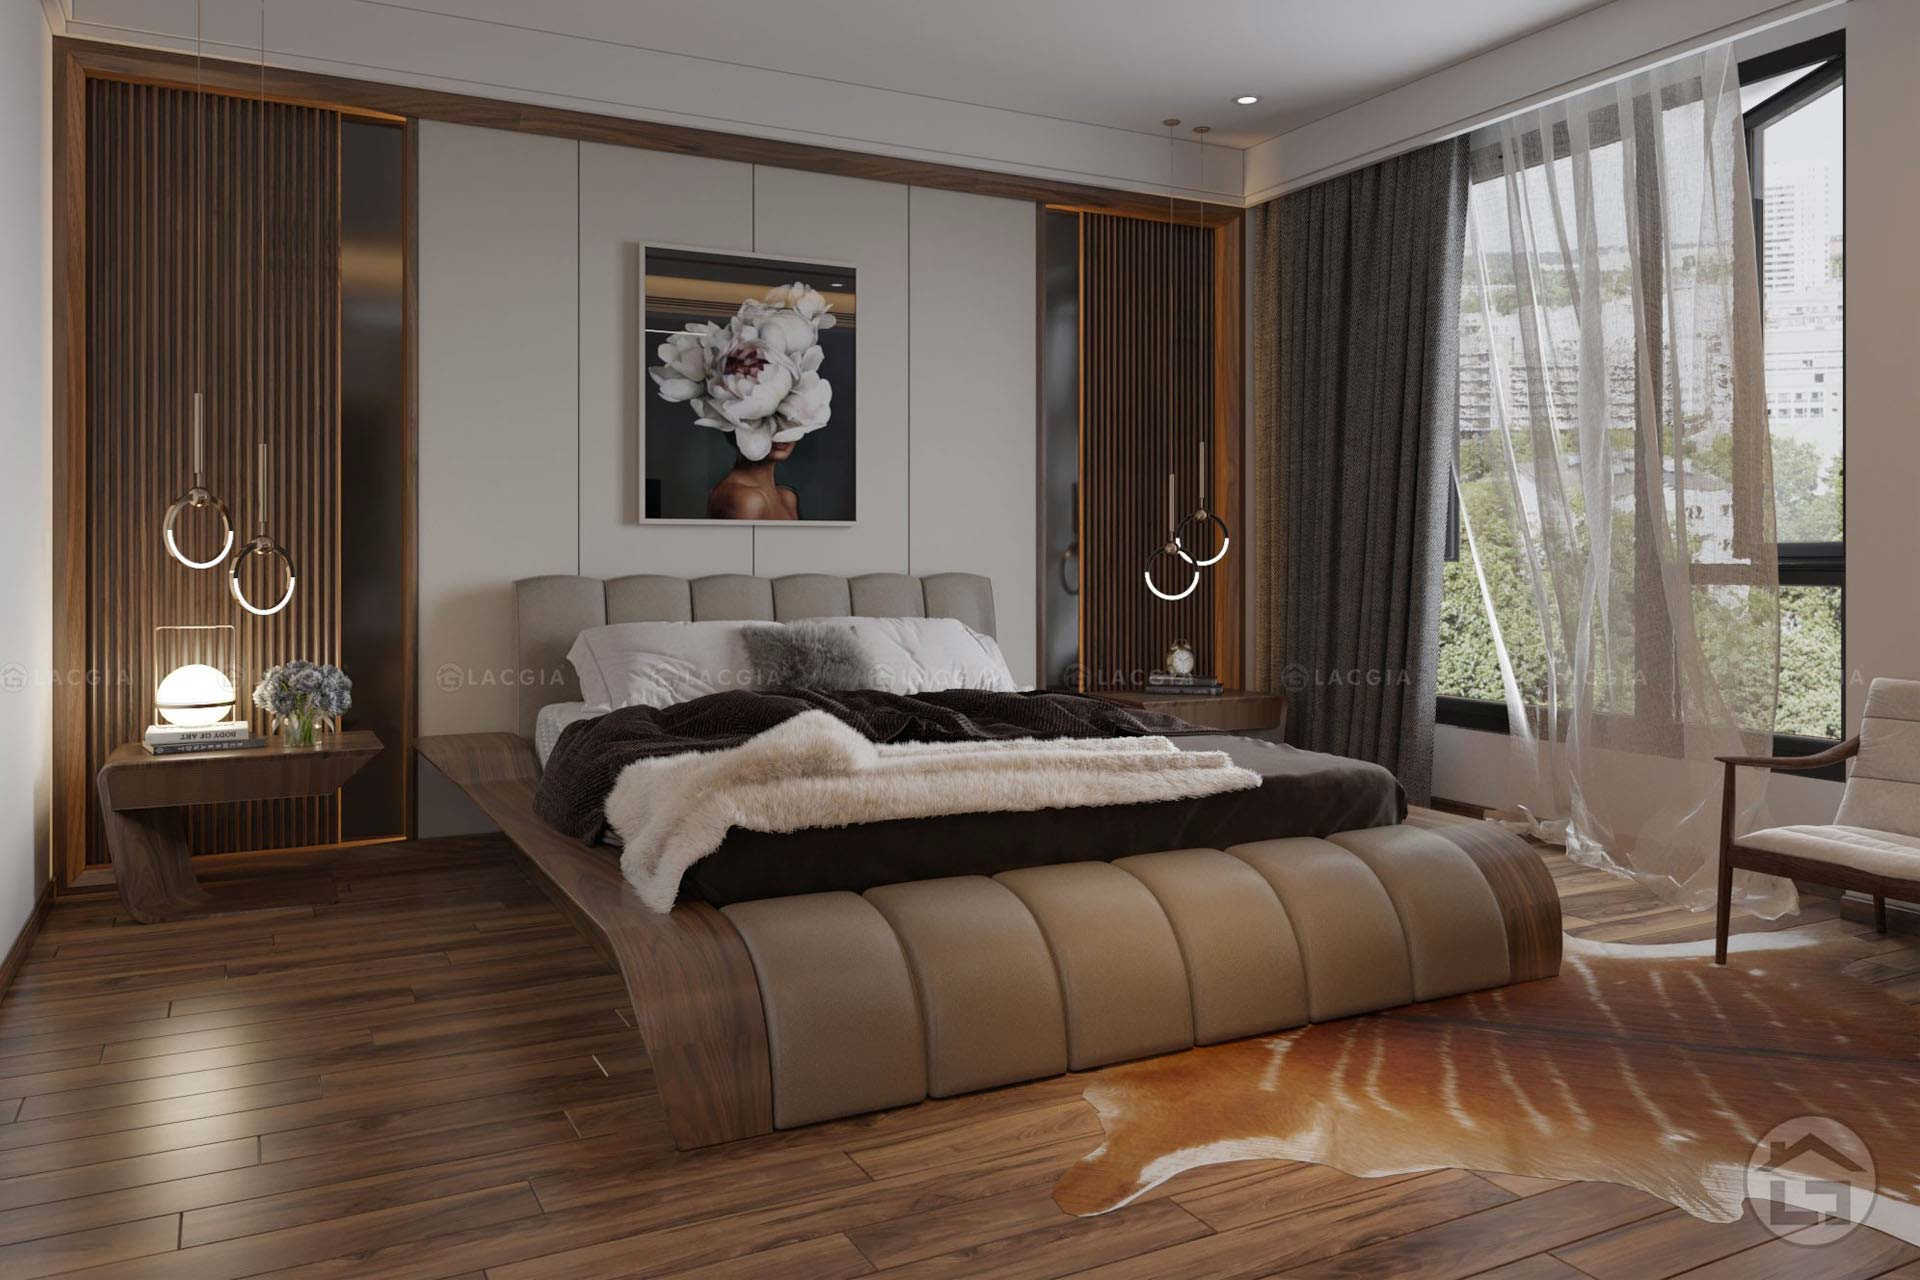 Giường ngủ cao cấp GN23